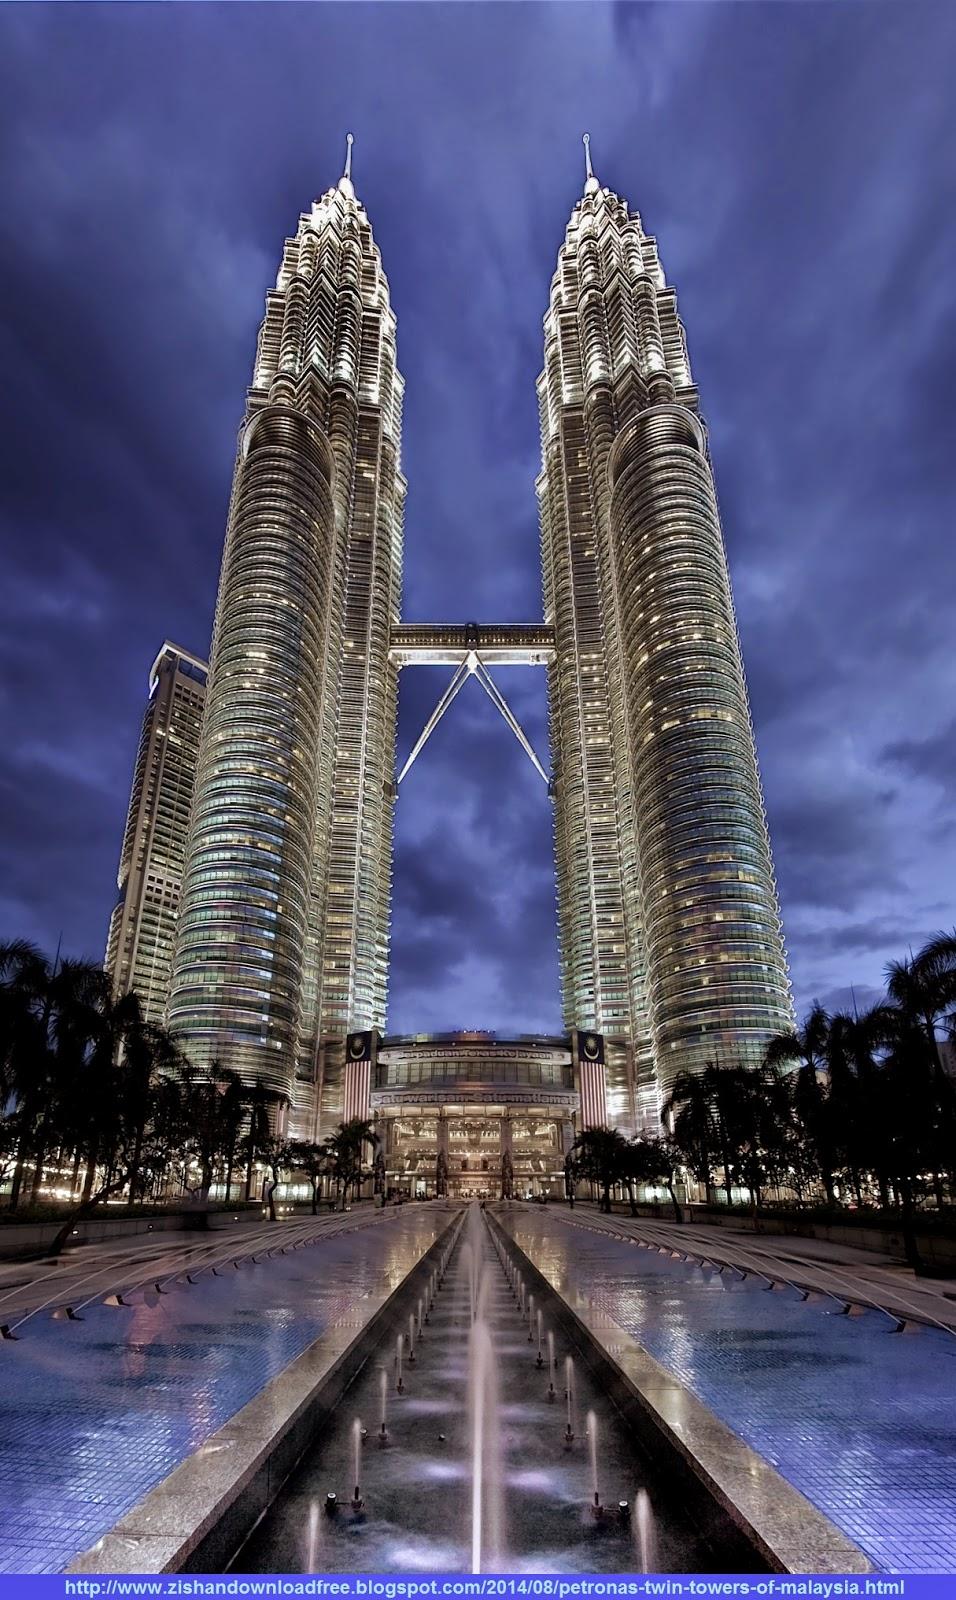 Petronas Twin Towers of Malaysia